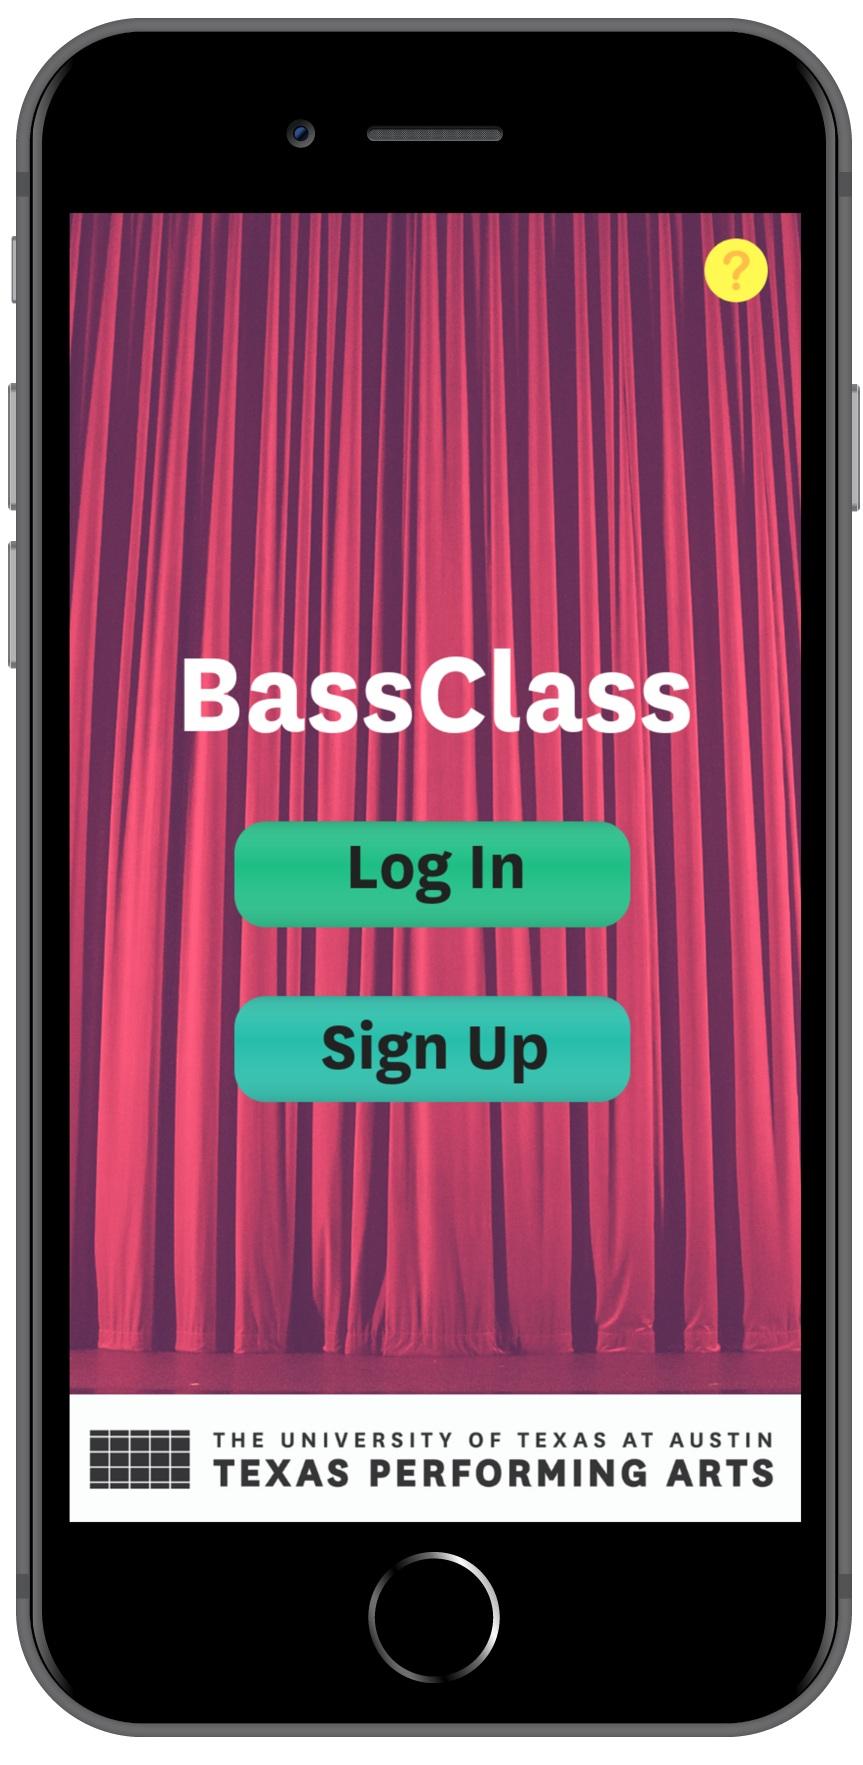 Bass Class_iphone8plusspacegrey_portrait.png